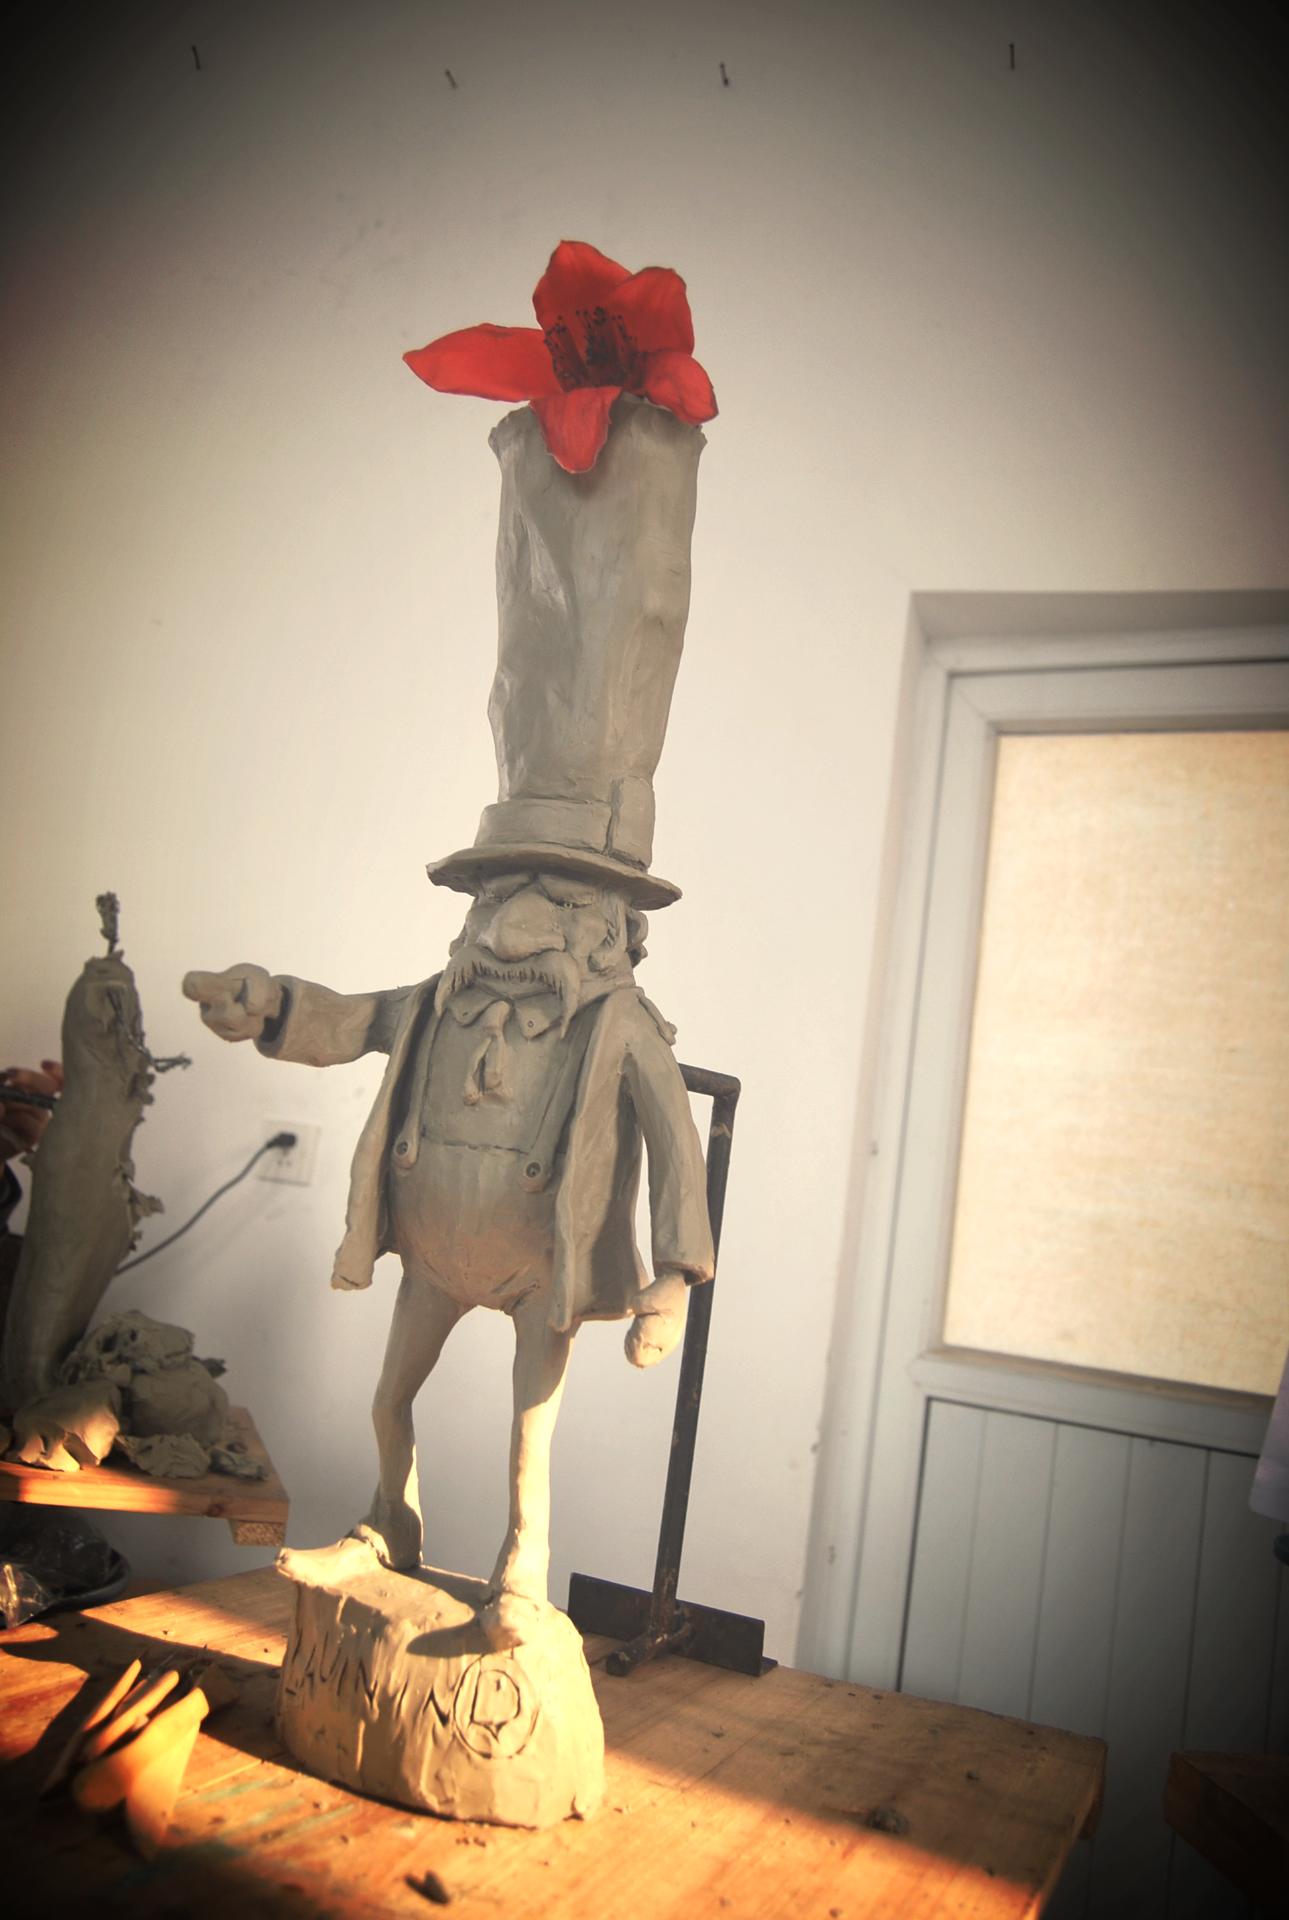 Mr. Hat